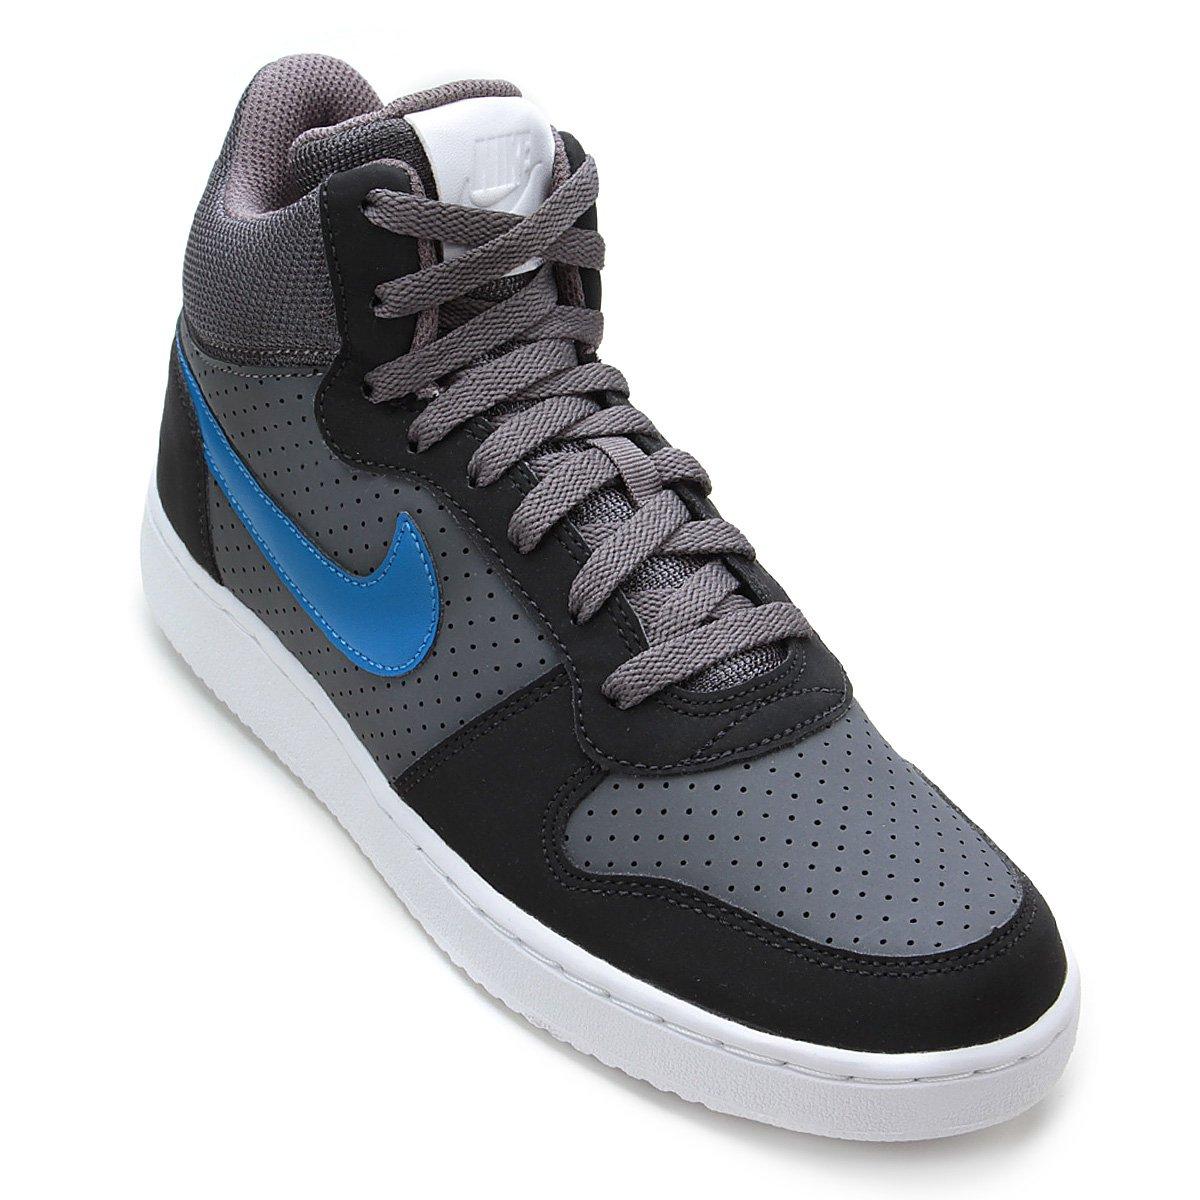 0b8b2c9f71c39 Tênis Couro Cano Alto Nike Recreation Mid Masculino